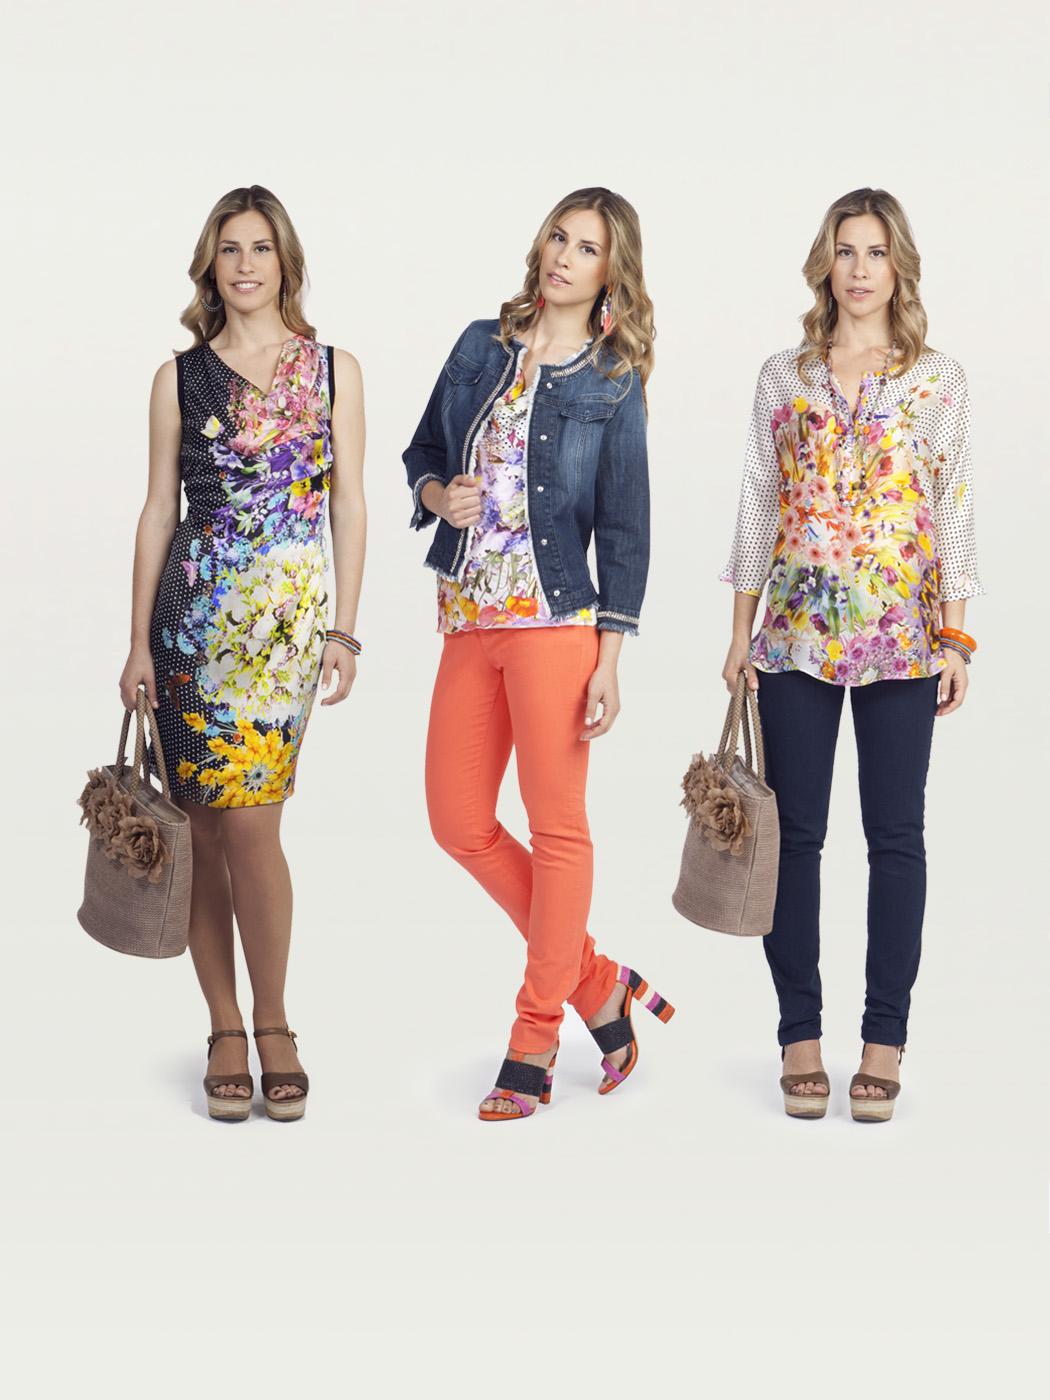 ana mora moda: